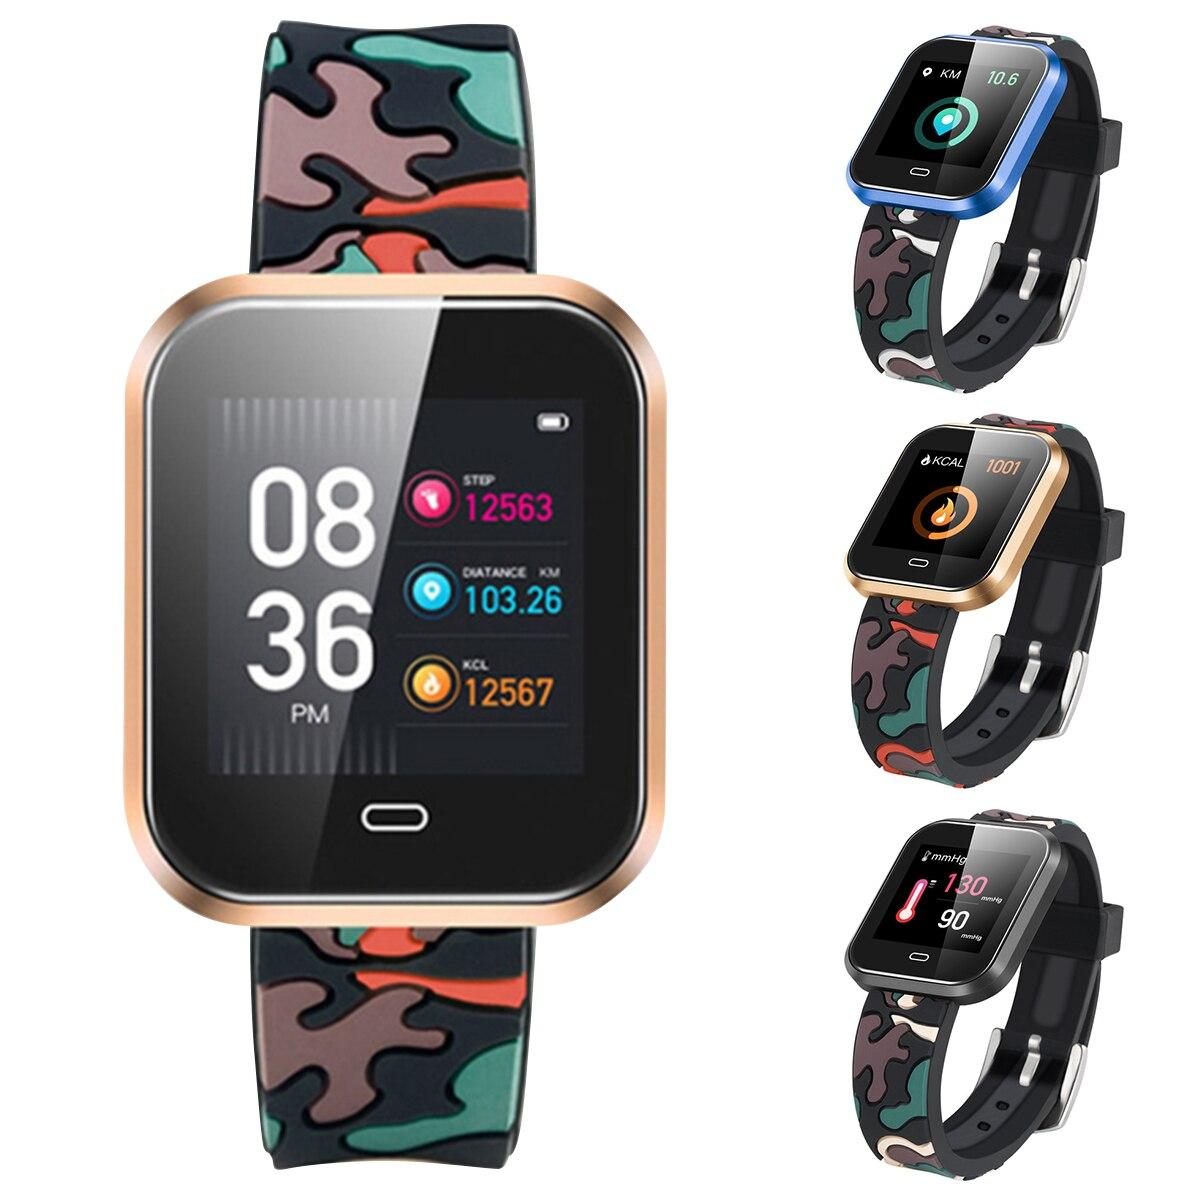 SOONHUA CD16 inteligente impermeable deportes Fitness pulsera presión arterial Monitor de ritmo cardíaco podómetro pantalla táctil de color de 1,3 pulgadas